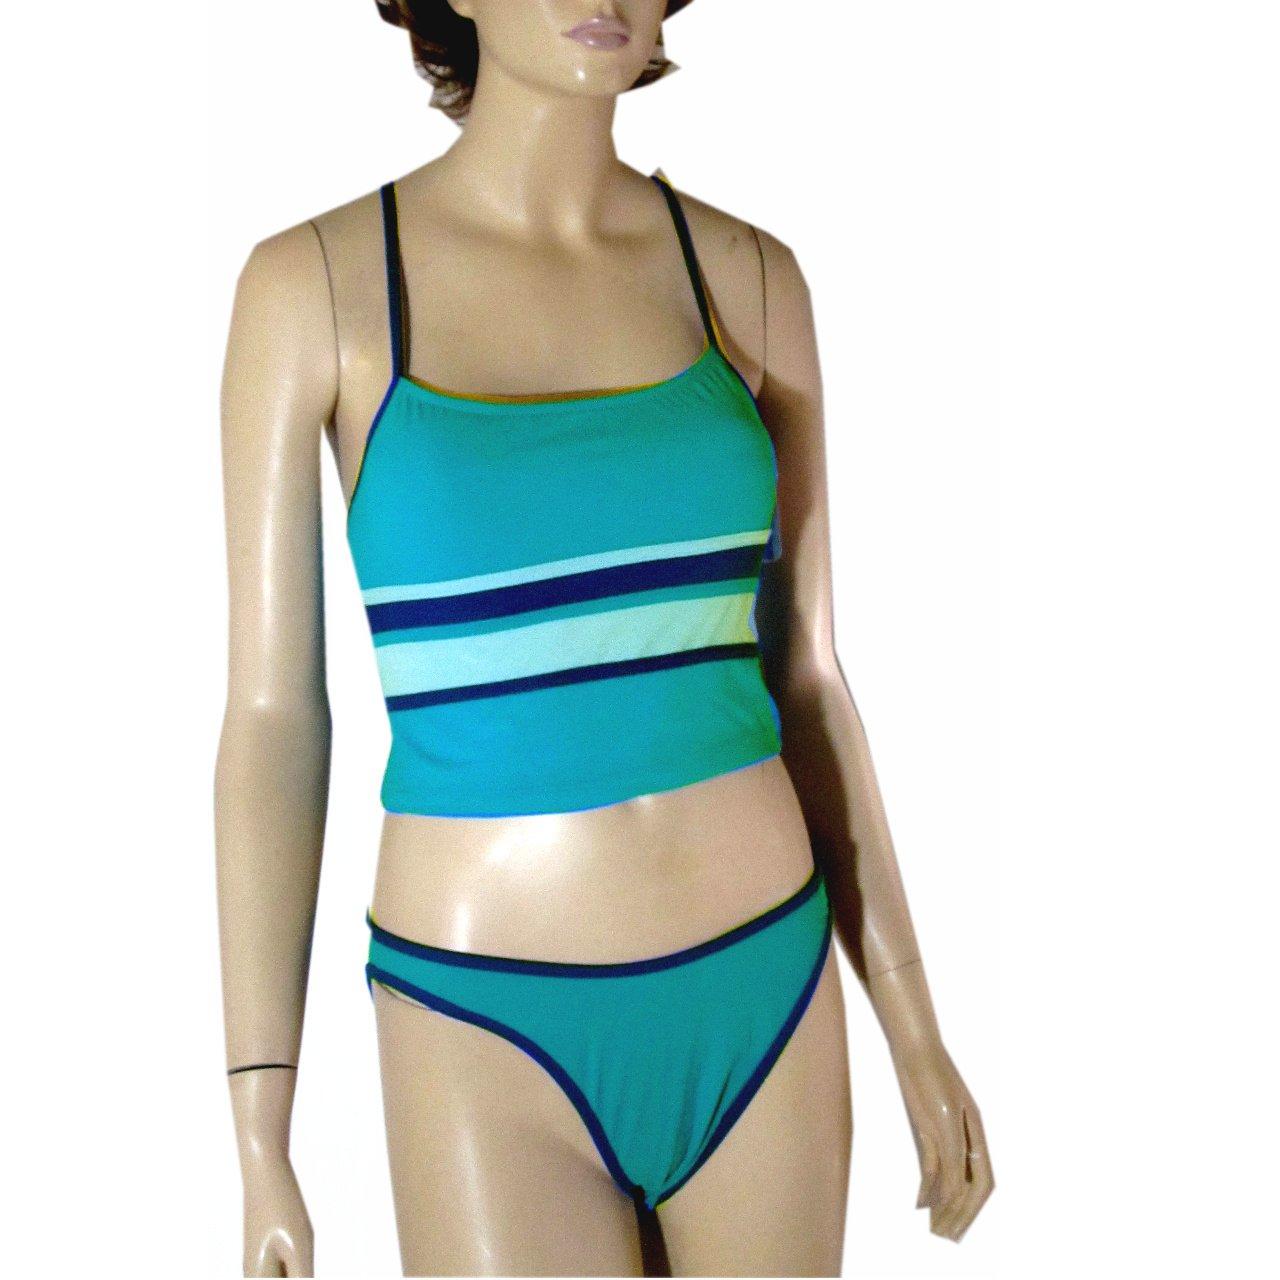 size Large Aqua & Blue Tankini Swimsuit by Beach Lingo $24.99